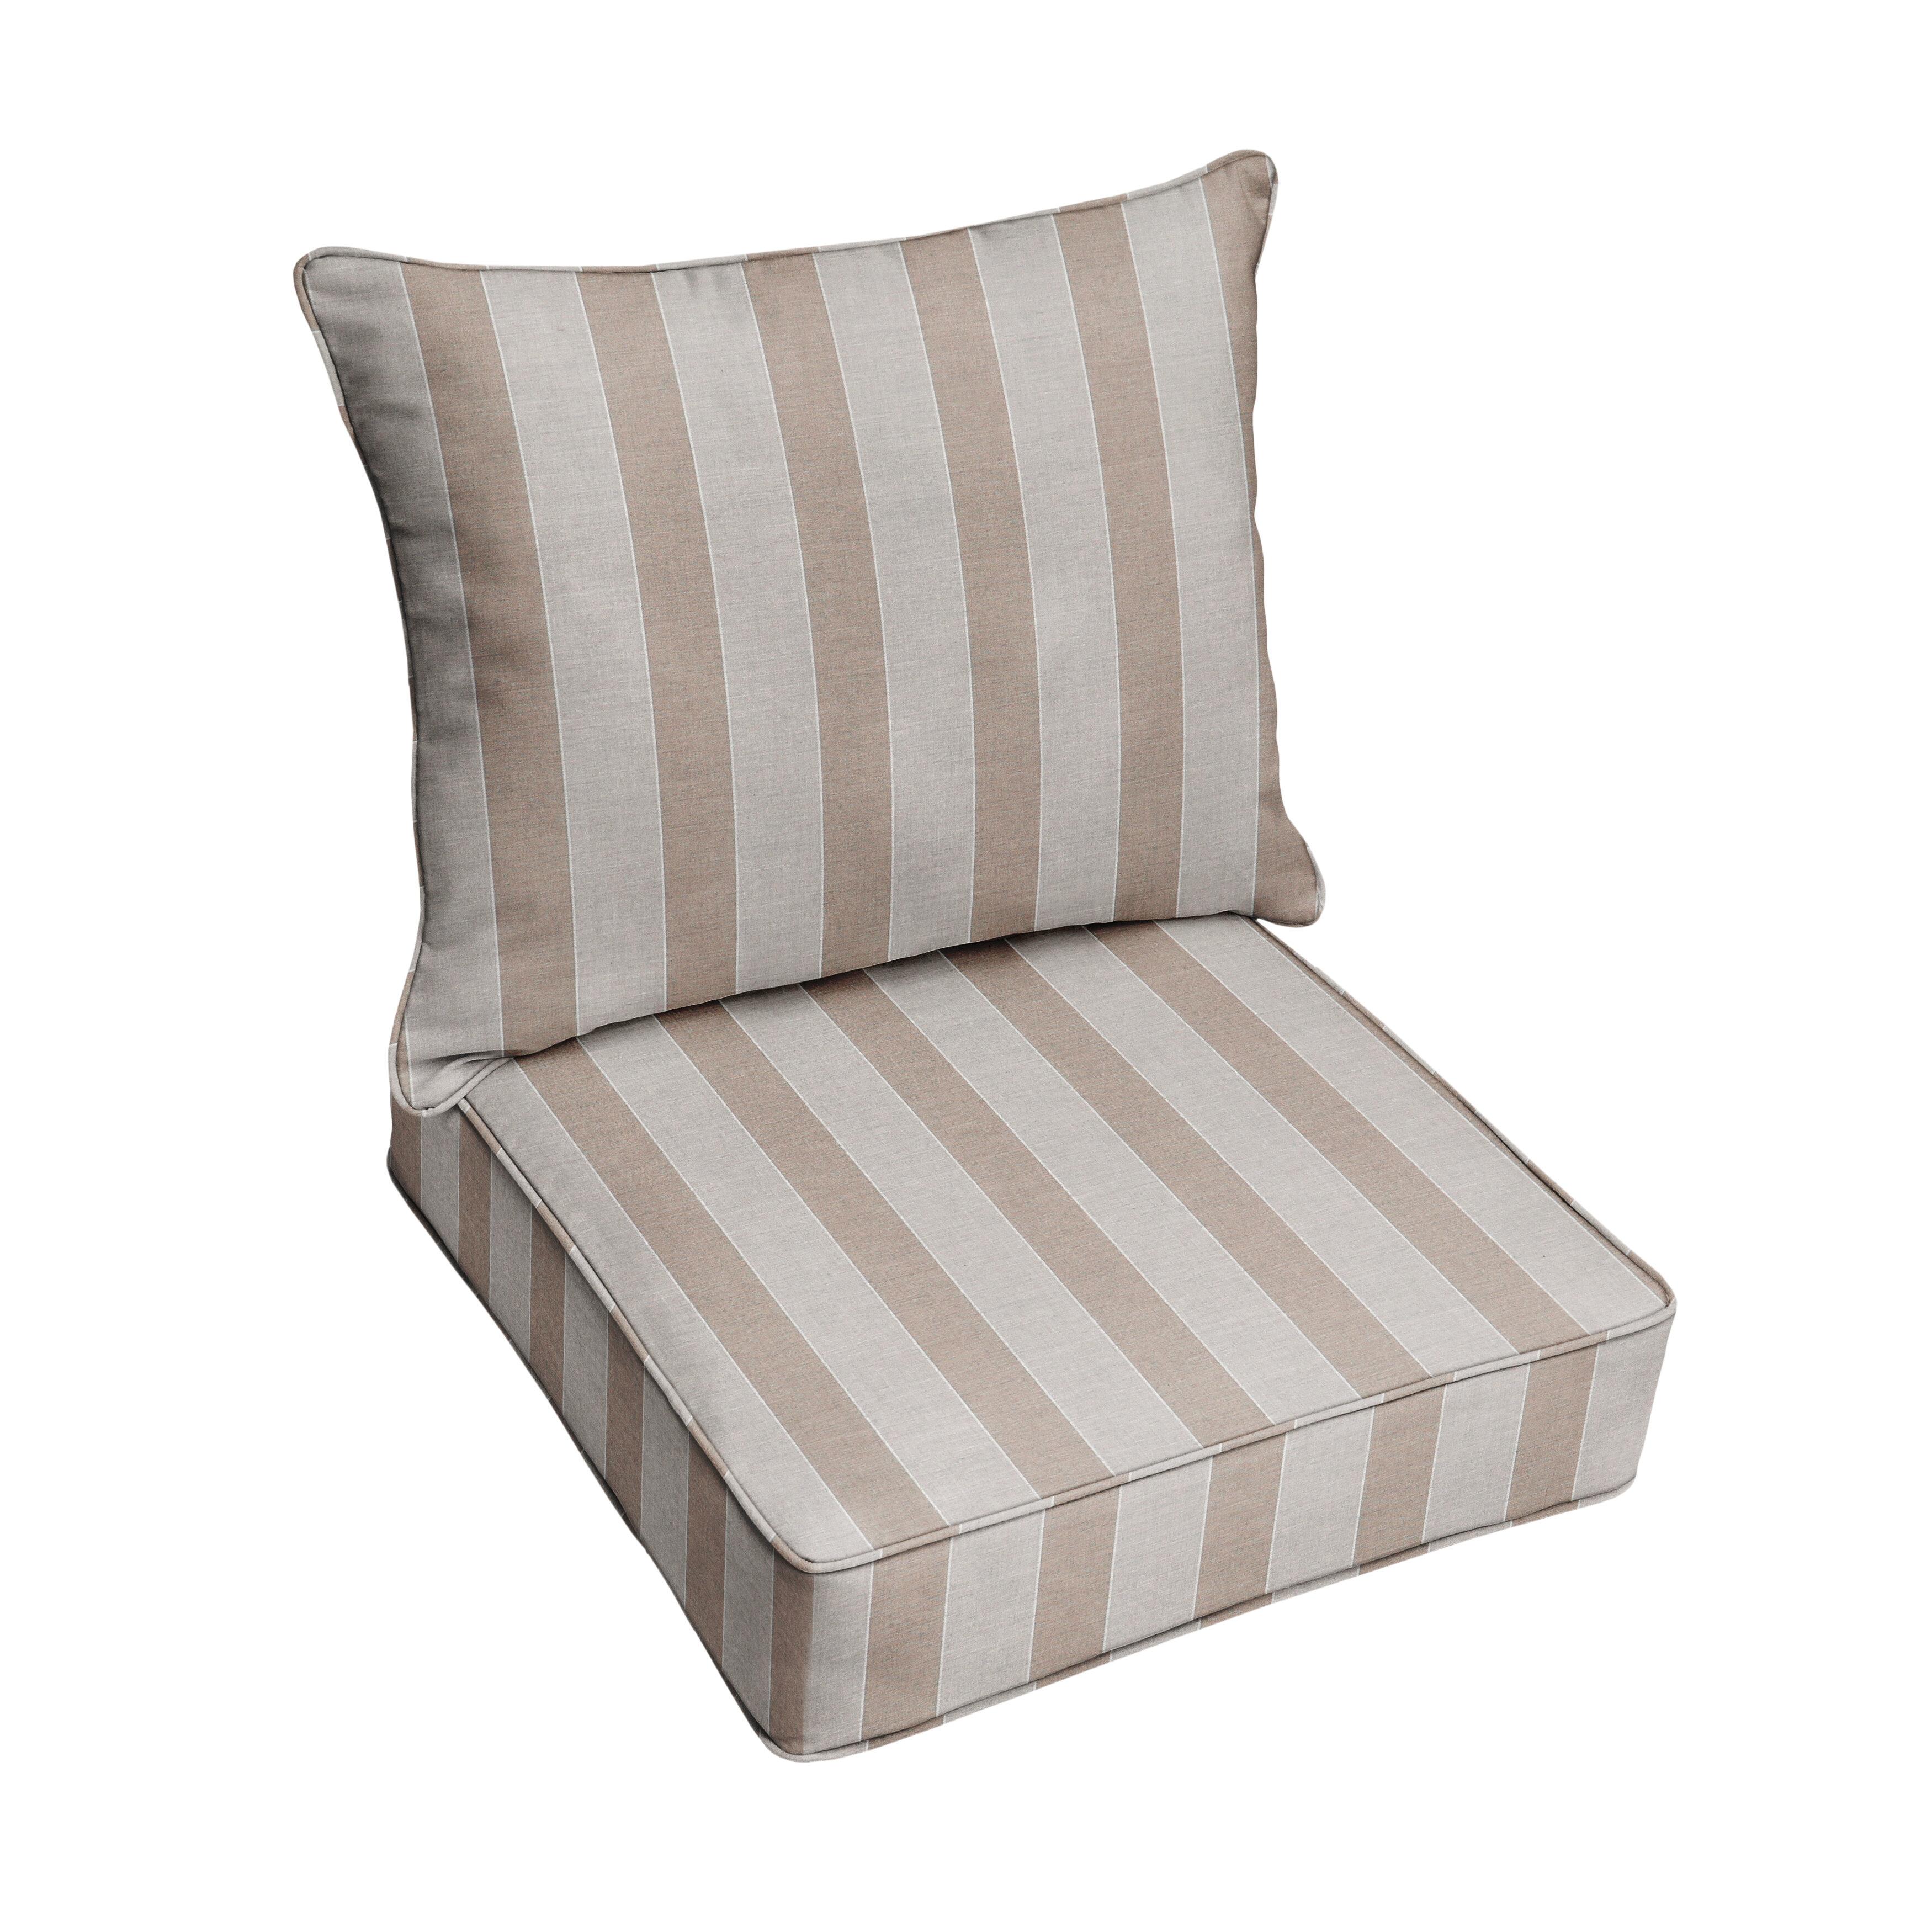 Range Dune Indoor Outdoor Sunbrella Seat Cushion Joss Main